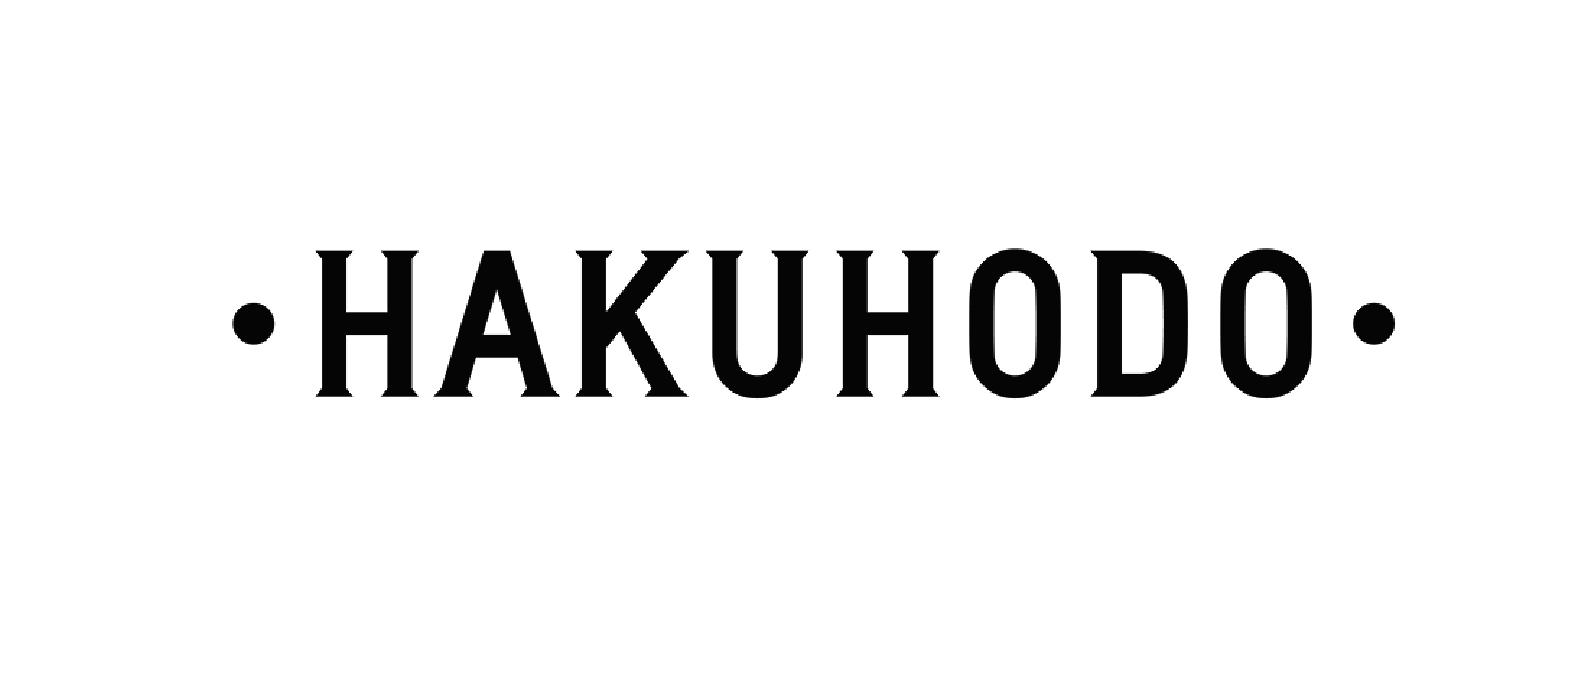 Hakudodo_Website.png